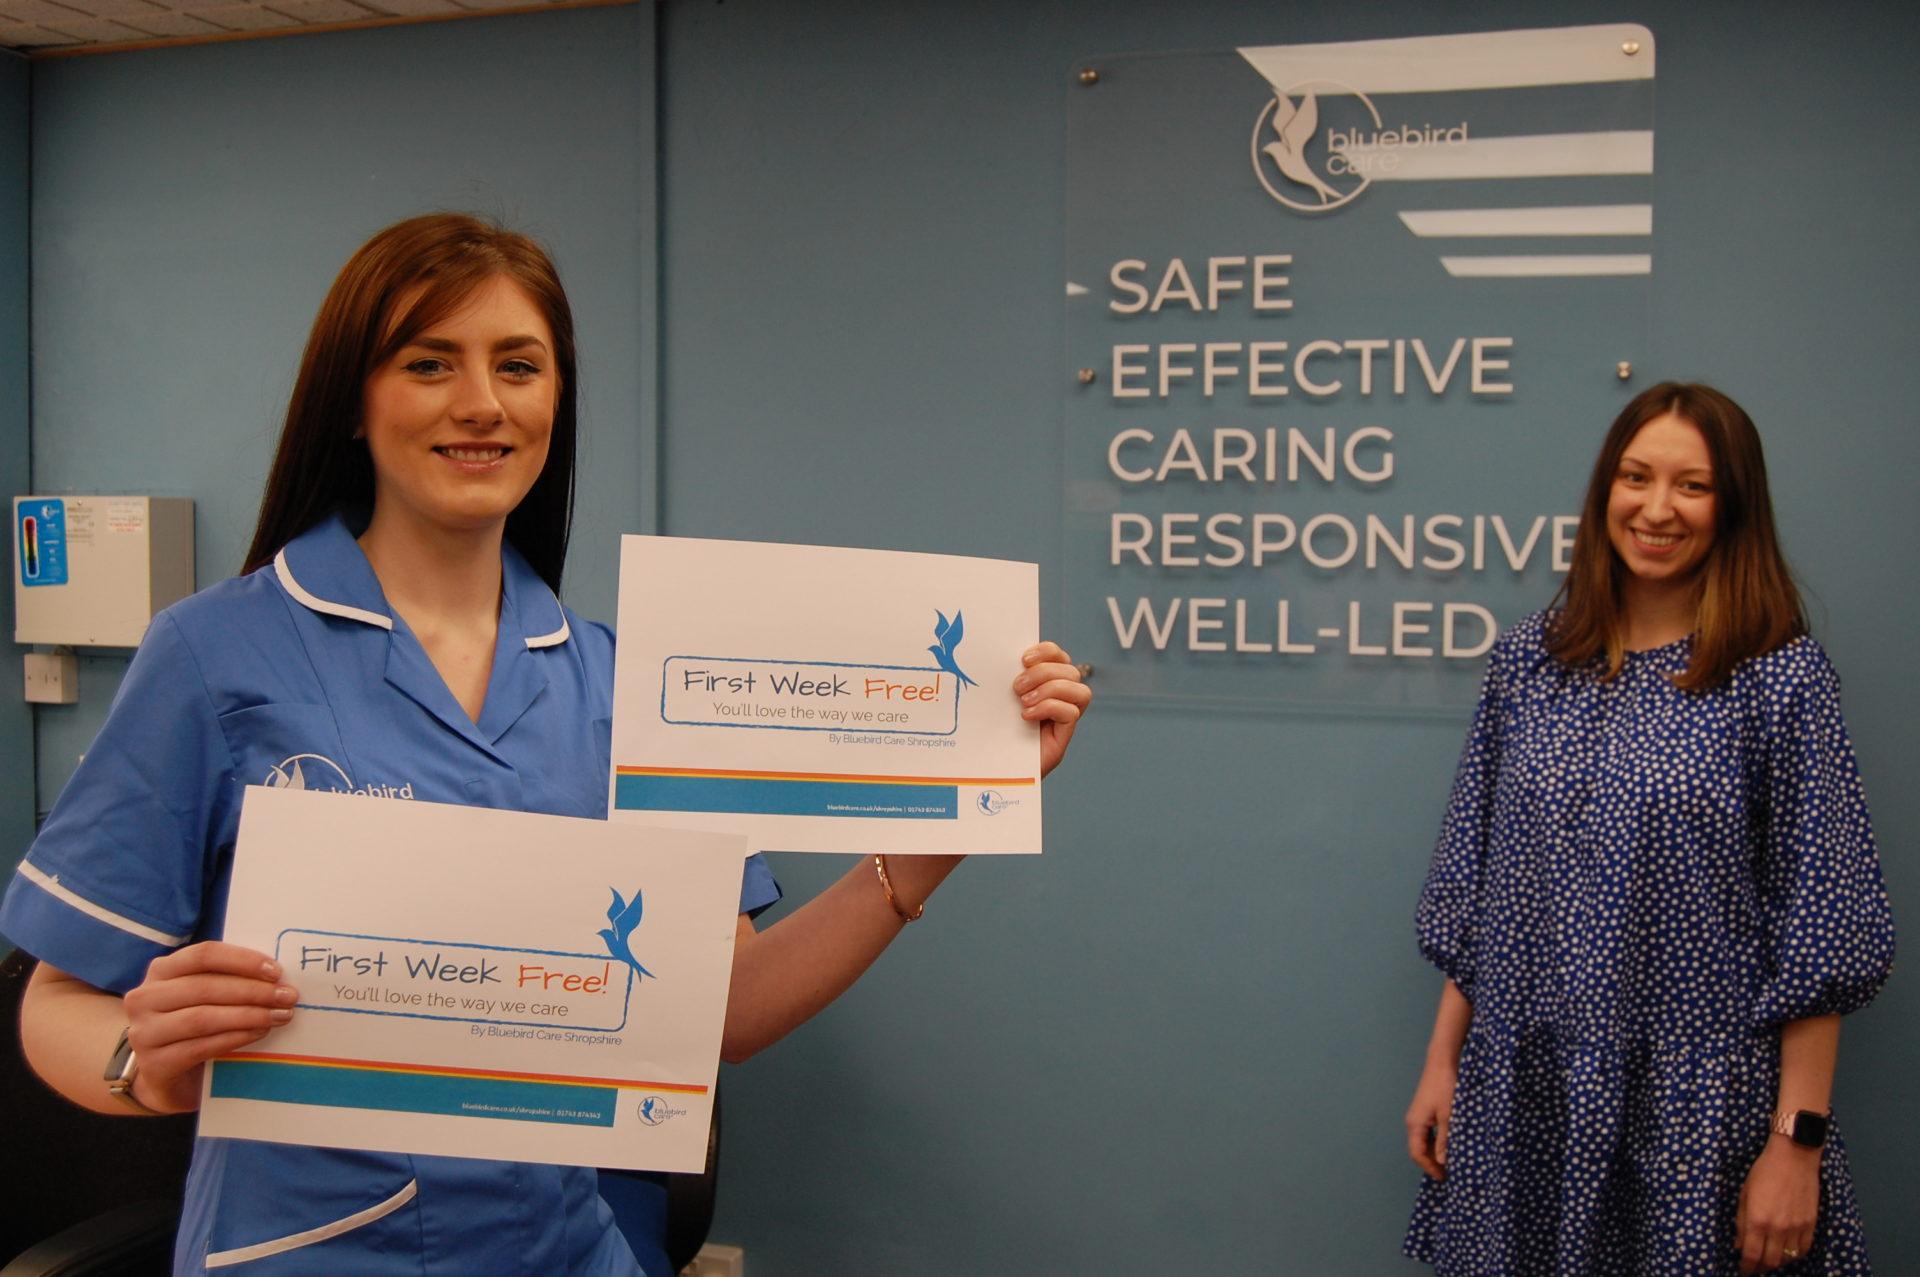 Georgia McNally Care Coordinator for Shrewsbury (in Bluebird Care tunic) Laura Allen, Lead Supervisor for Shropshire.